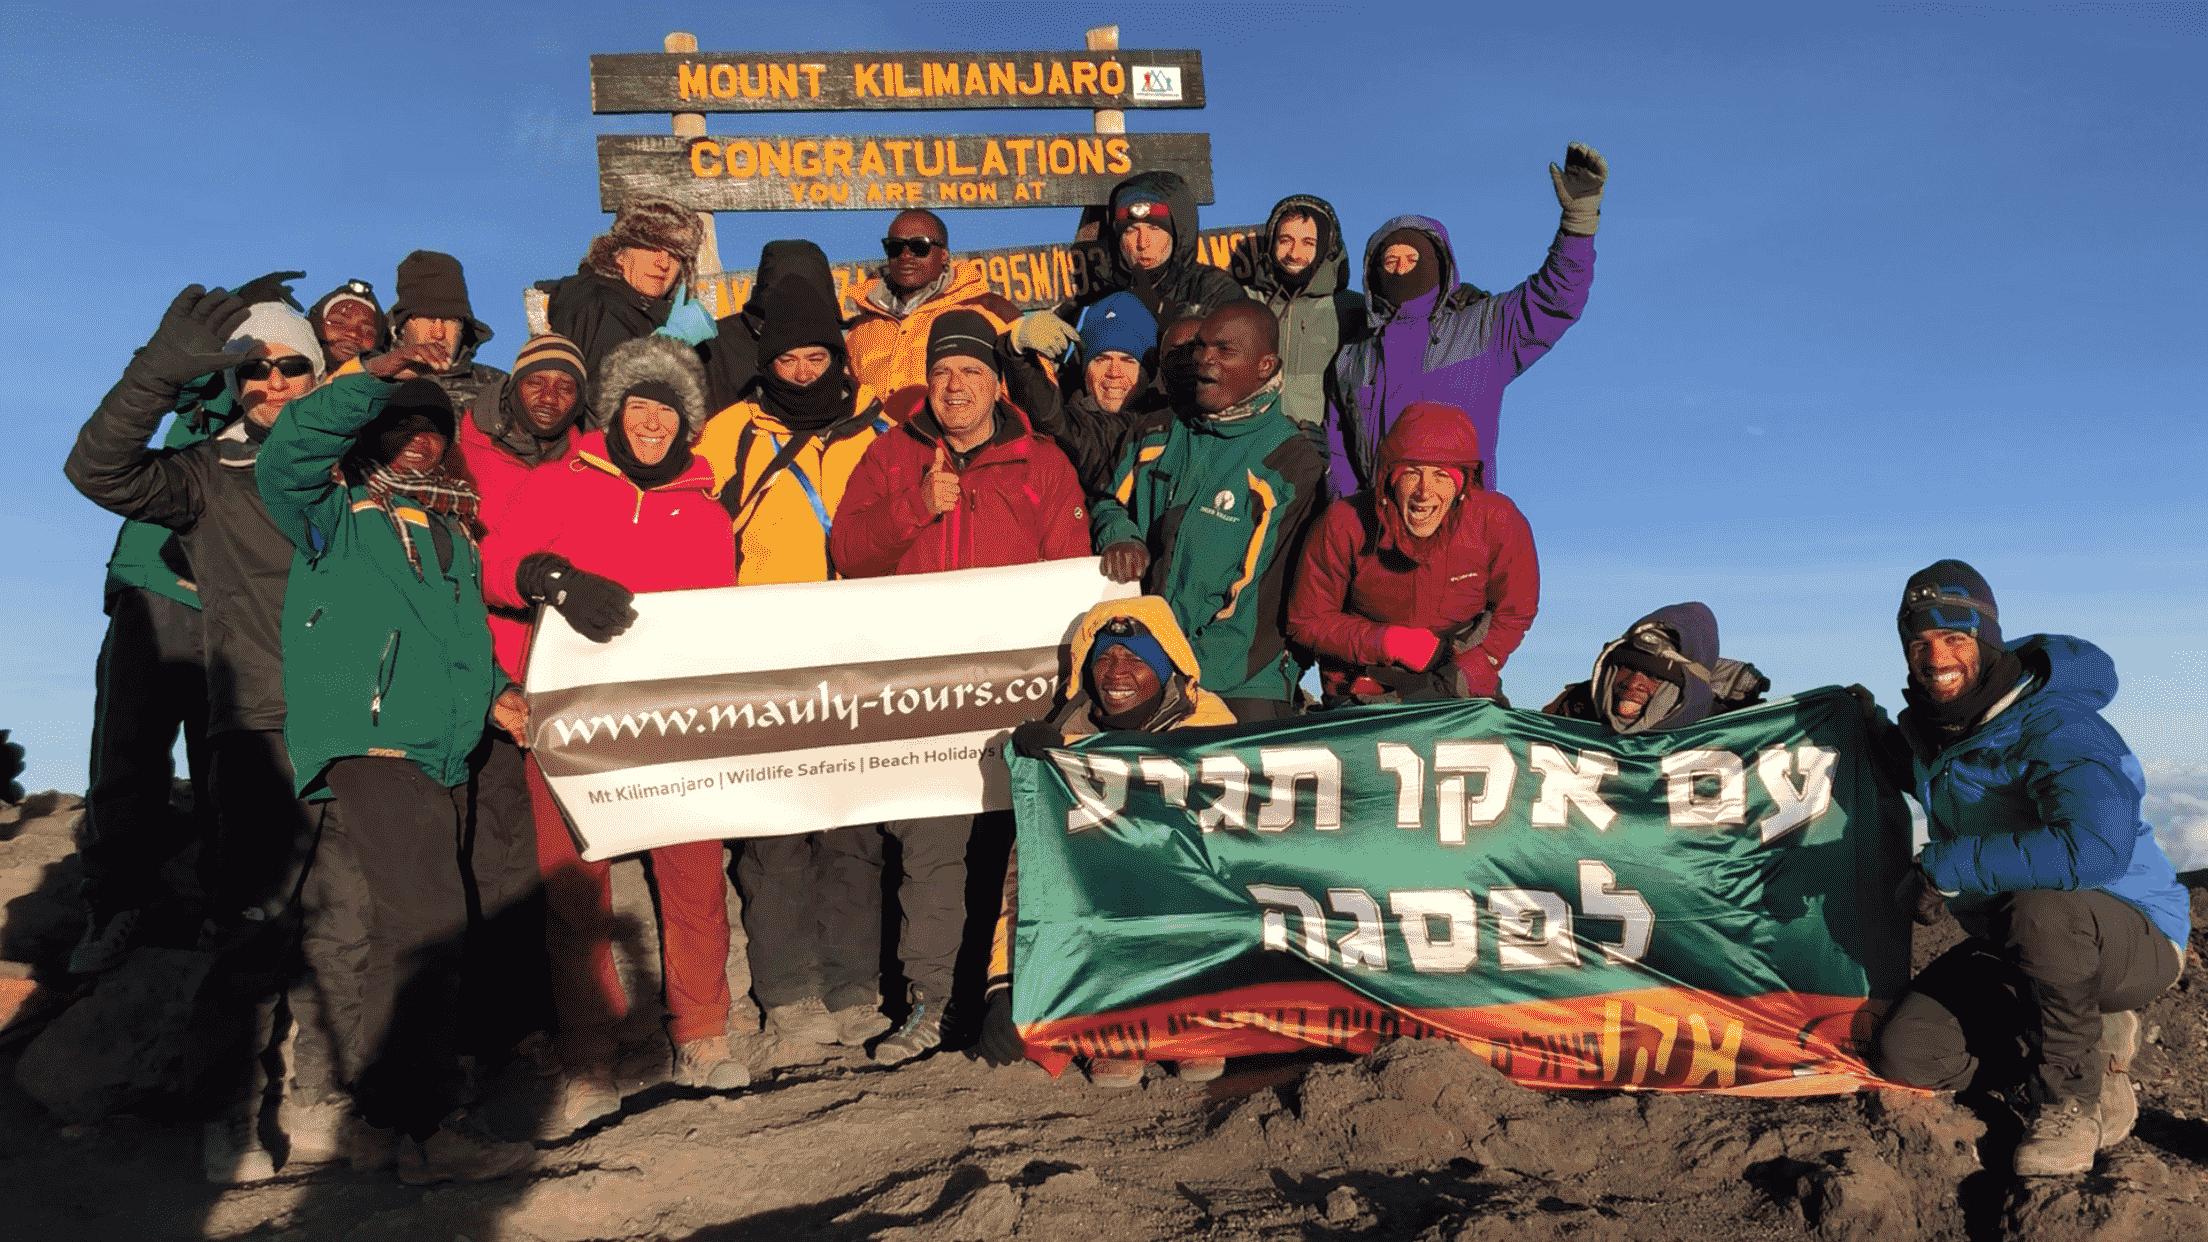 Kilimanjaro eco omer ziv